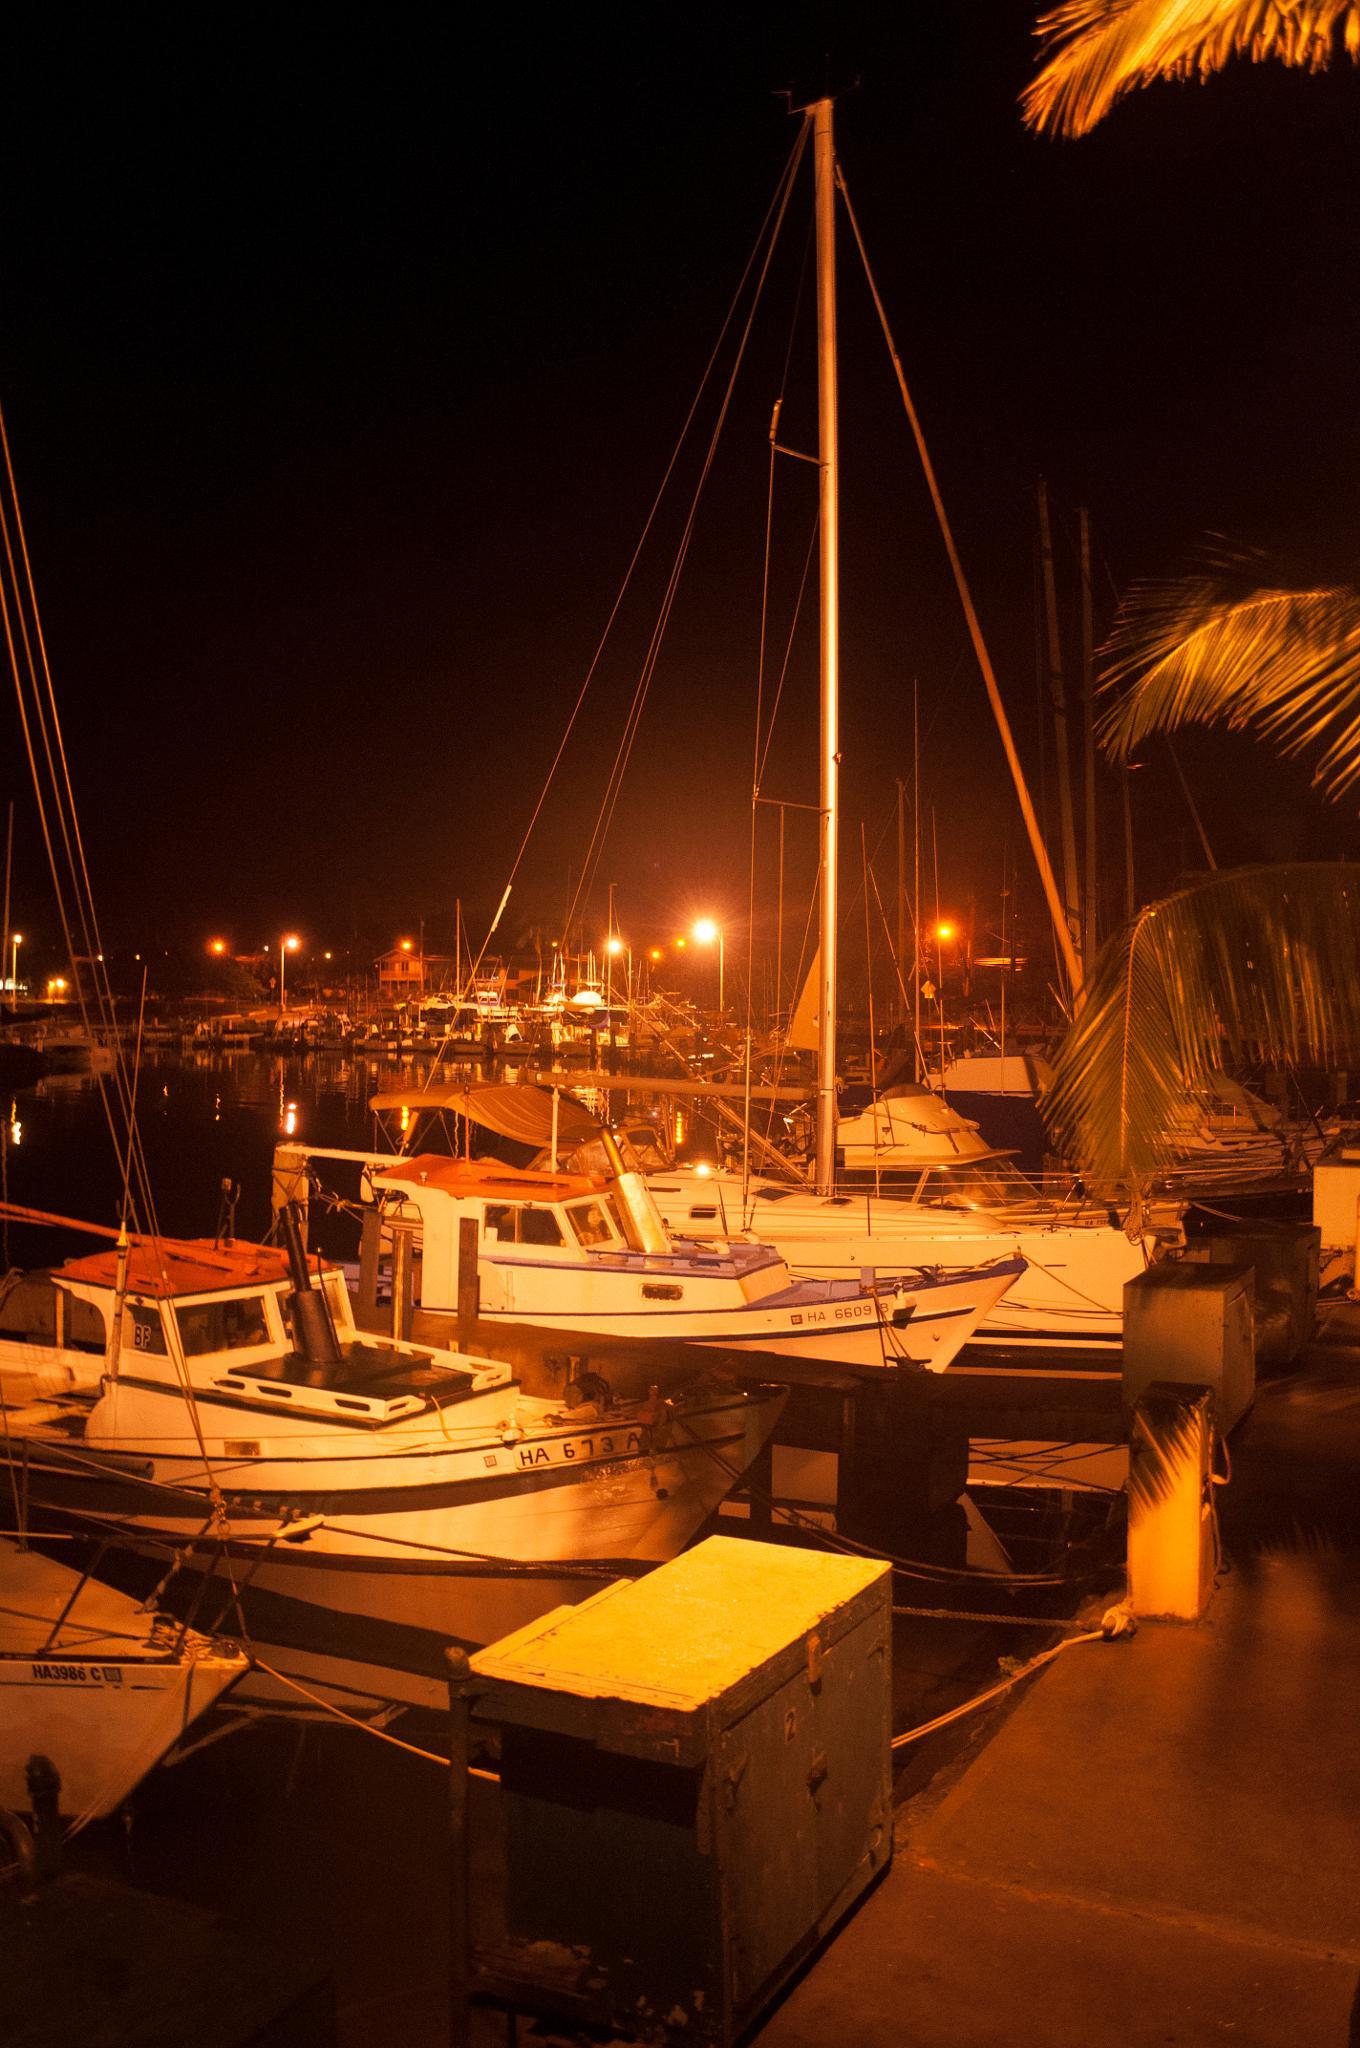 Night Marina by Sophia von Wrangell